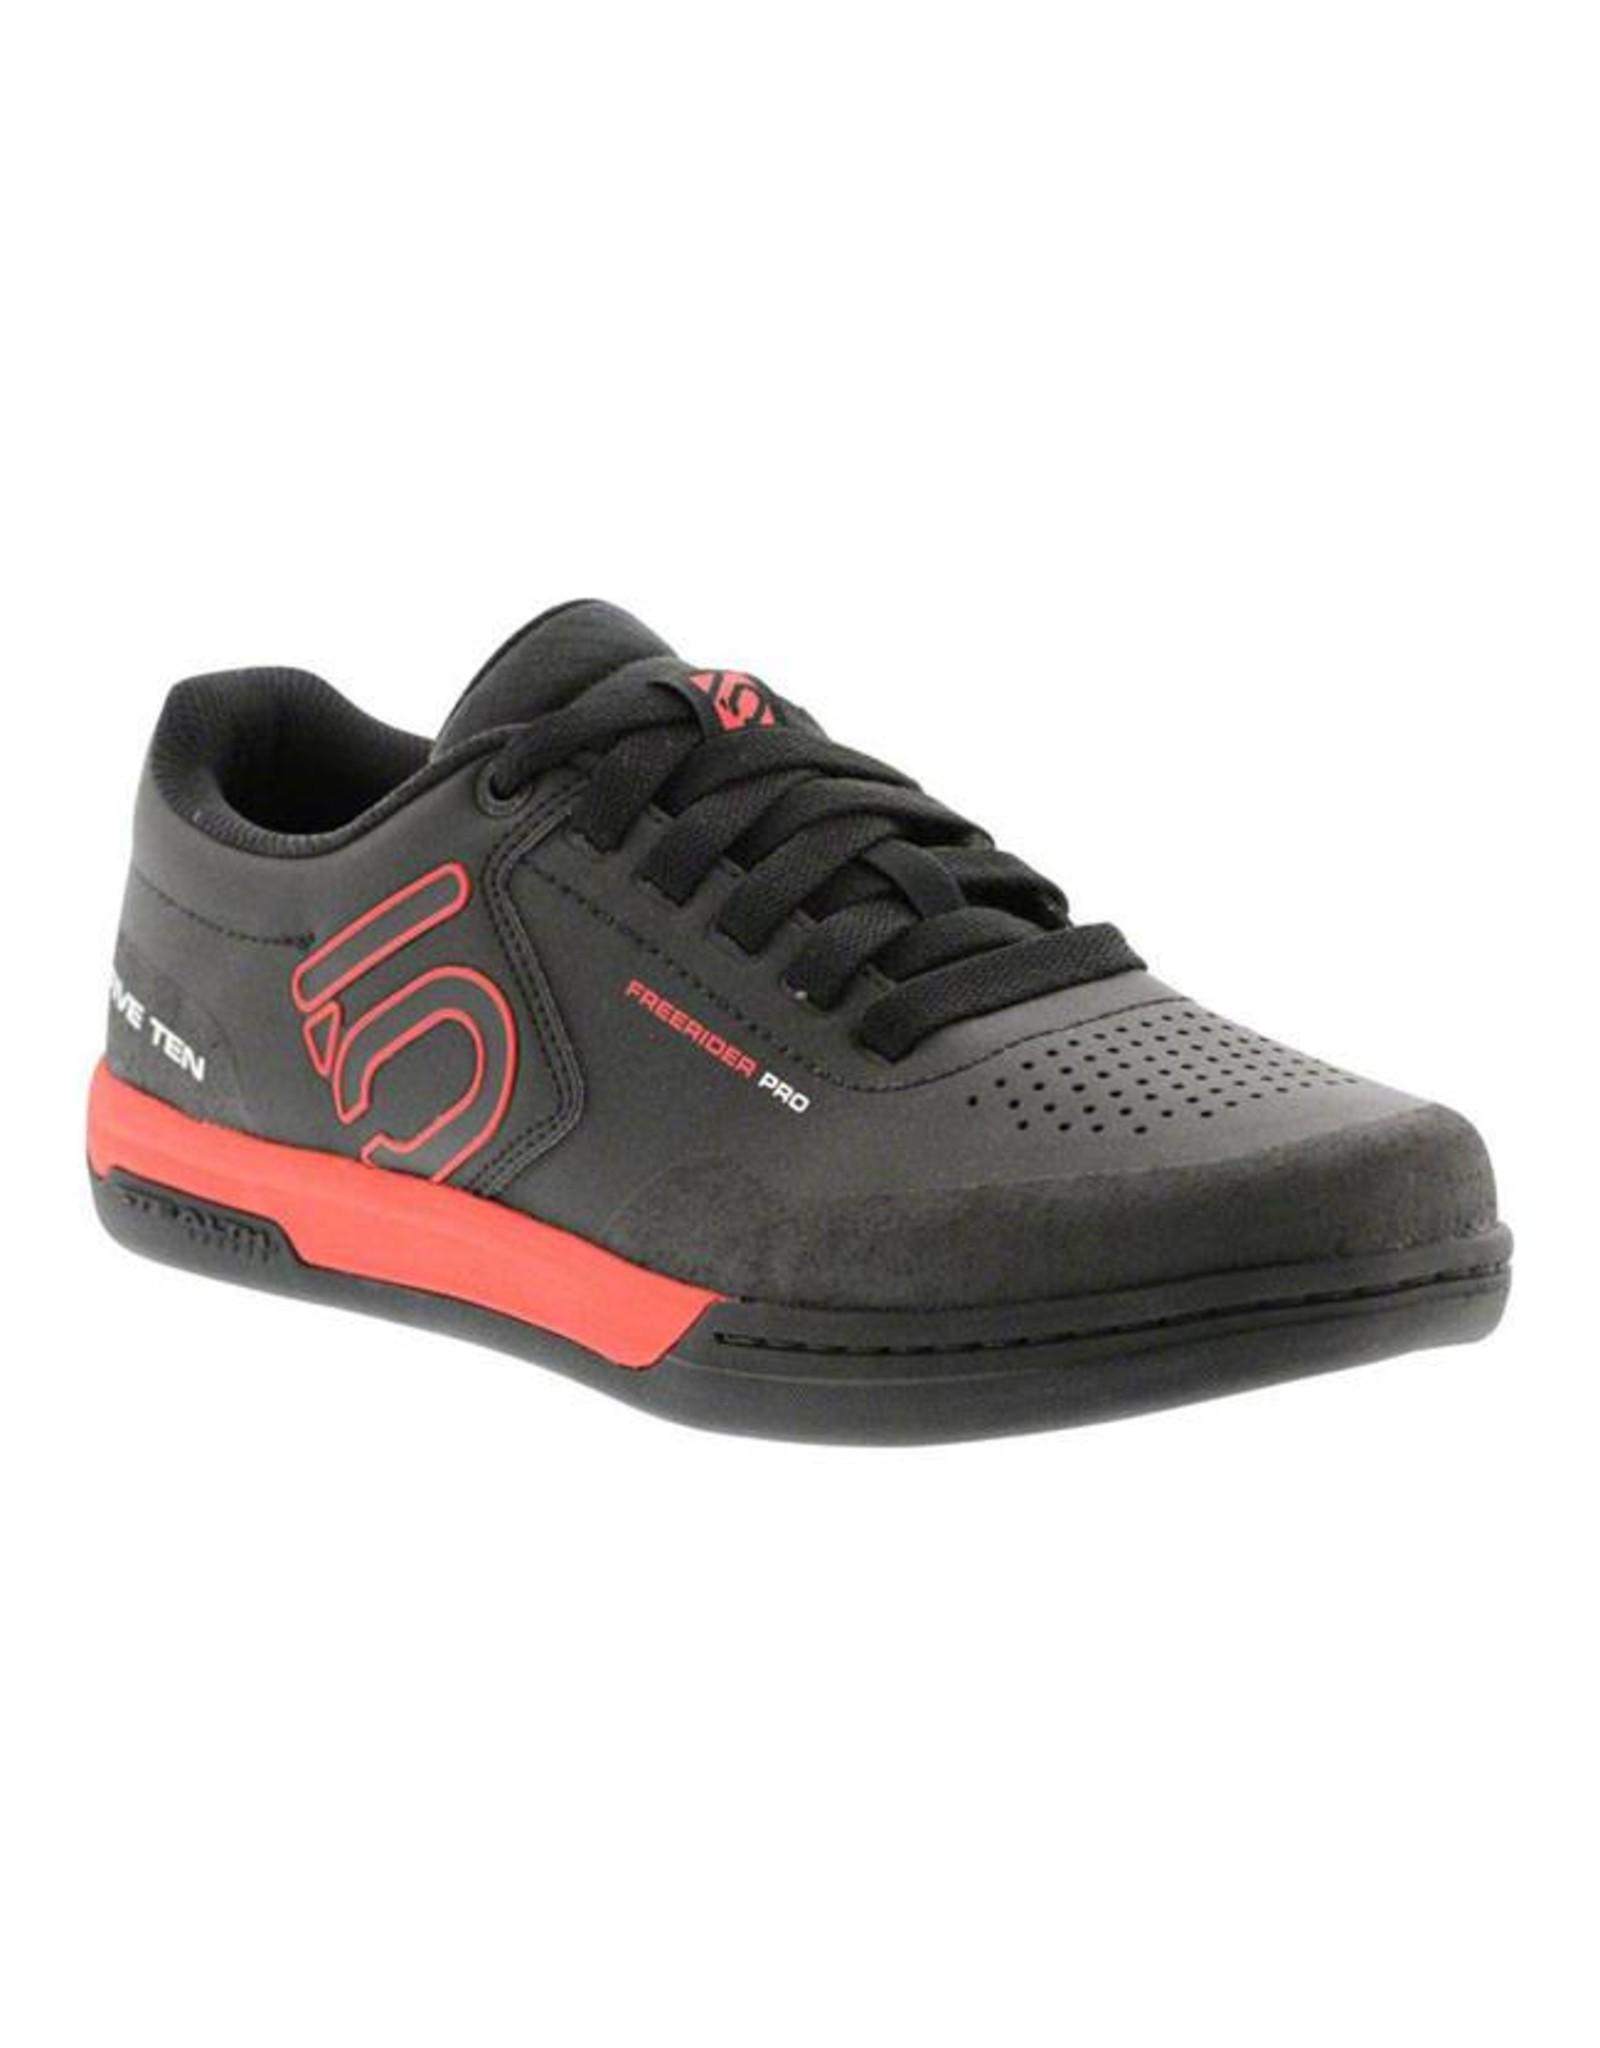 Five Ten Five Ten Freerider Pro Men's Flat Pedal Shoe: Black 12